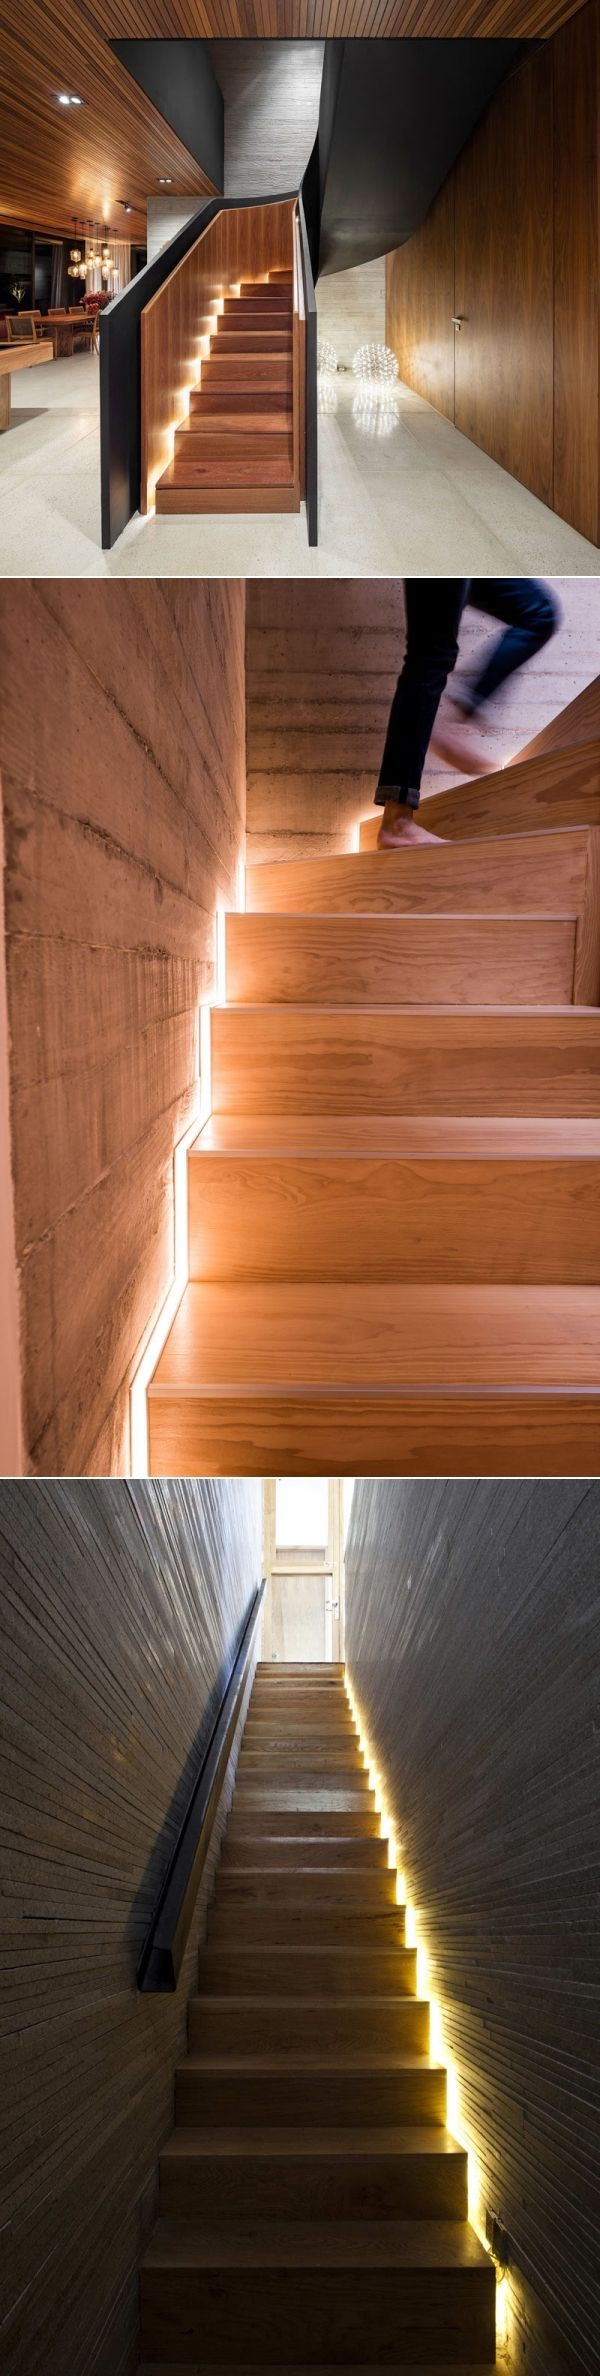 The 25+ best Hidden lighting ideas on Pinterest   Indirect ...